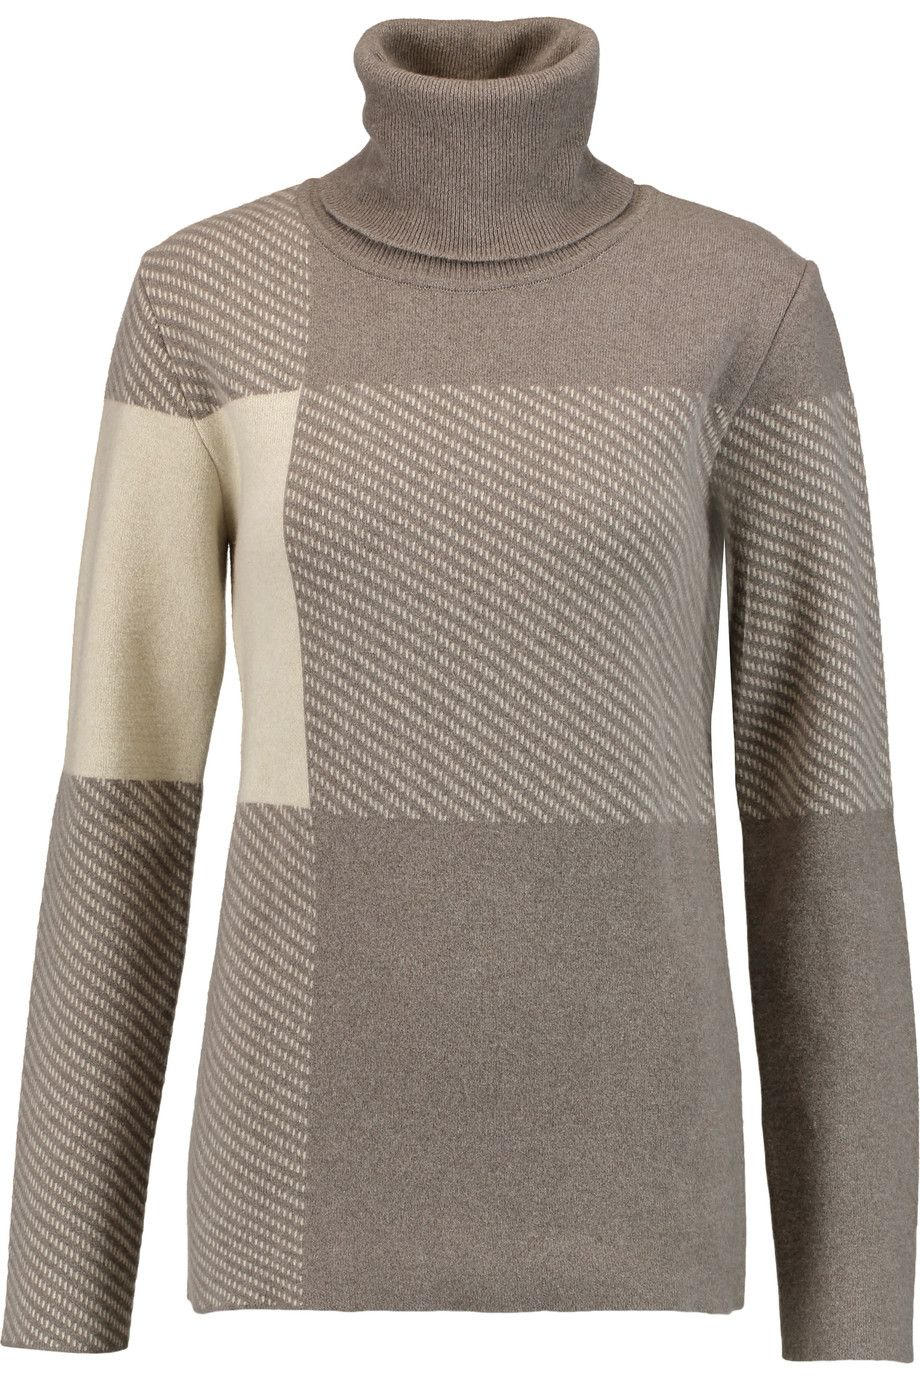 CHLOÉ Jacquard-knit wool-blend turtleneck sweater. #chloé #cloth #sweater